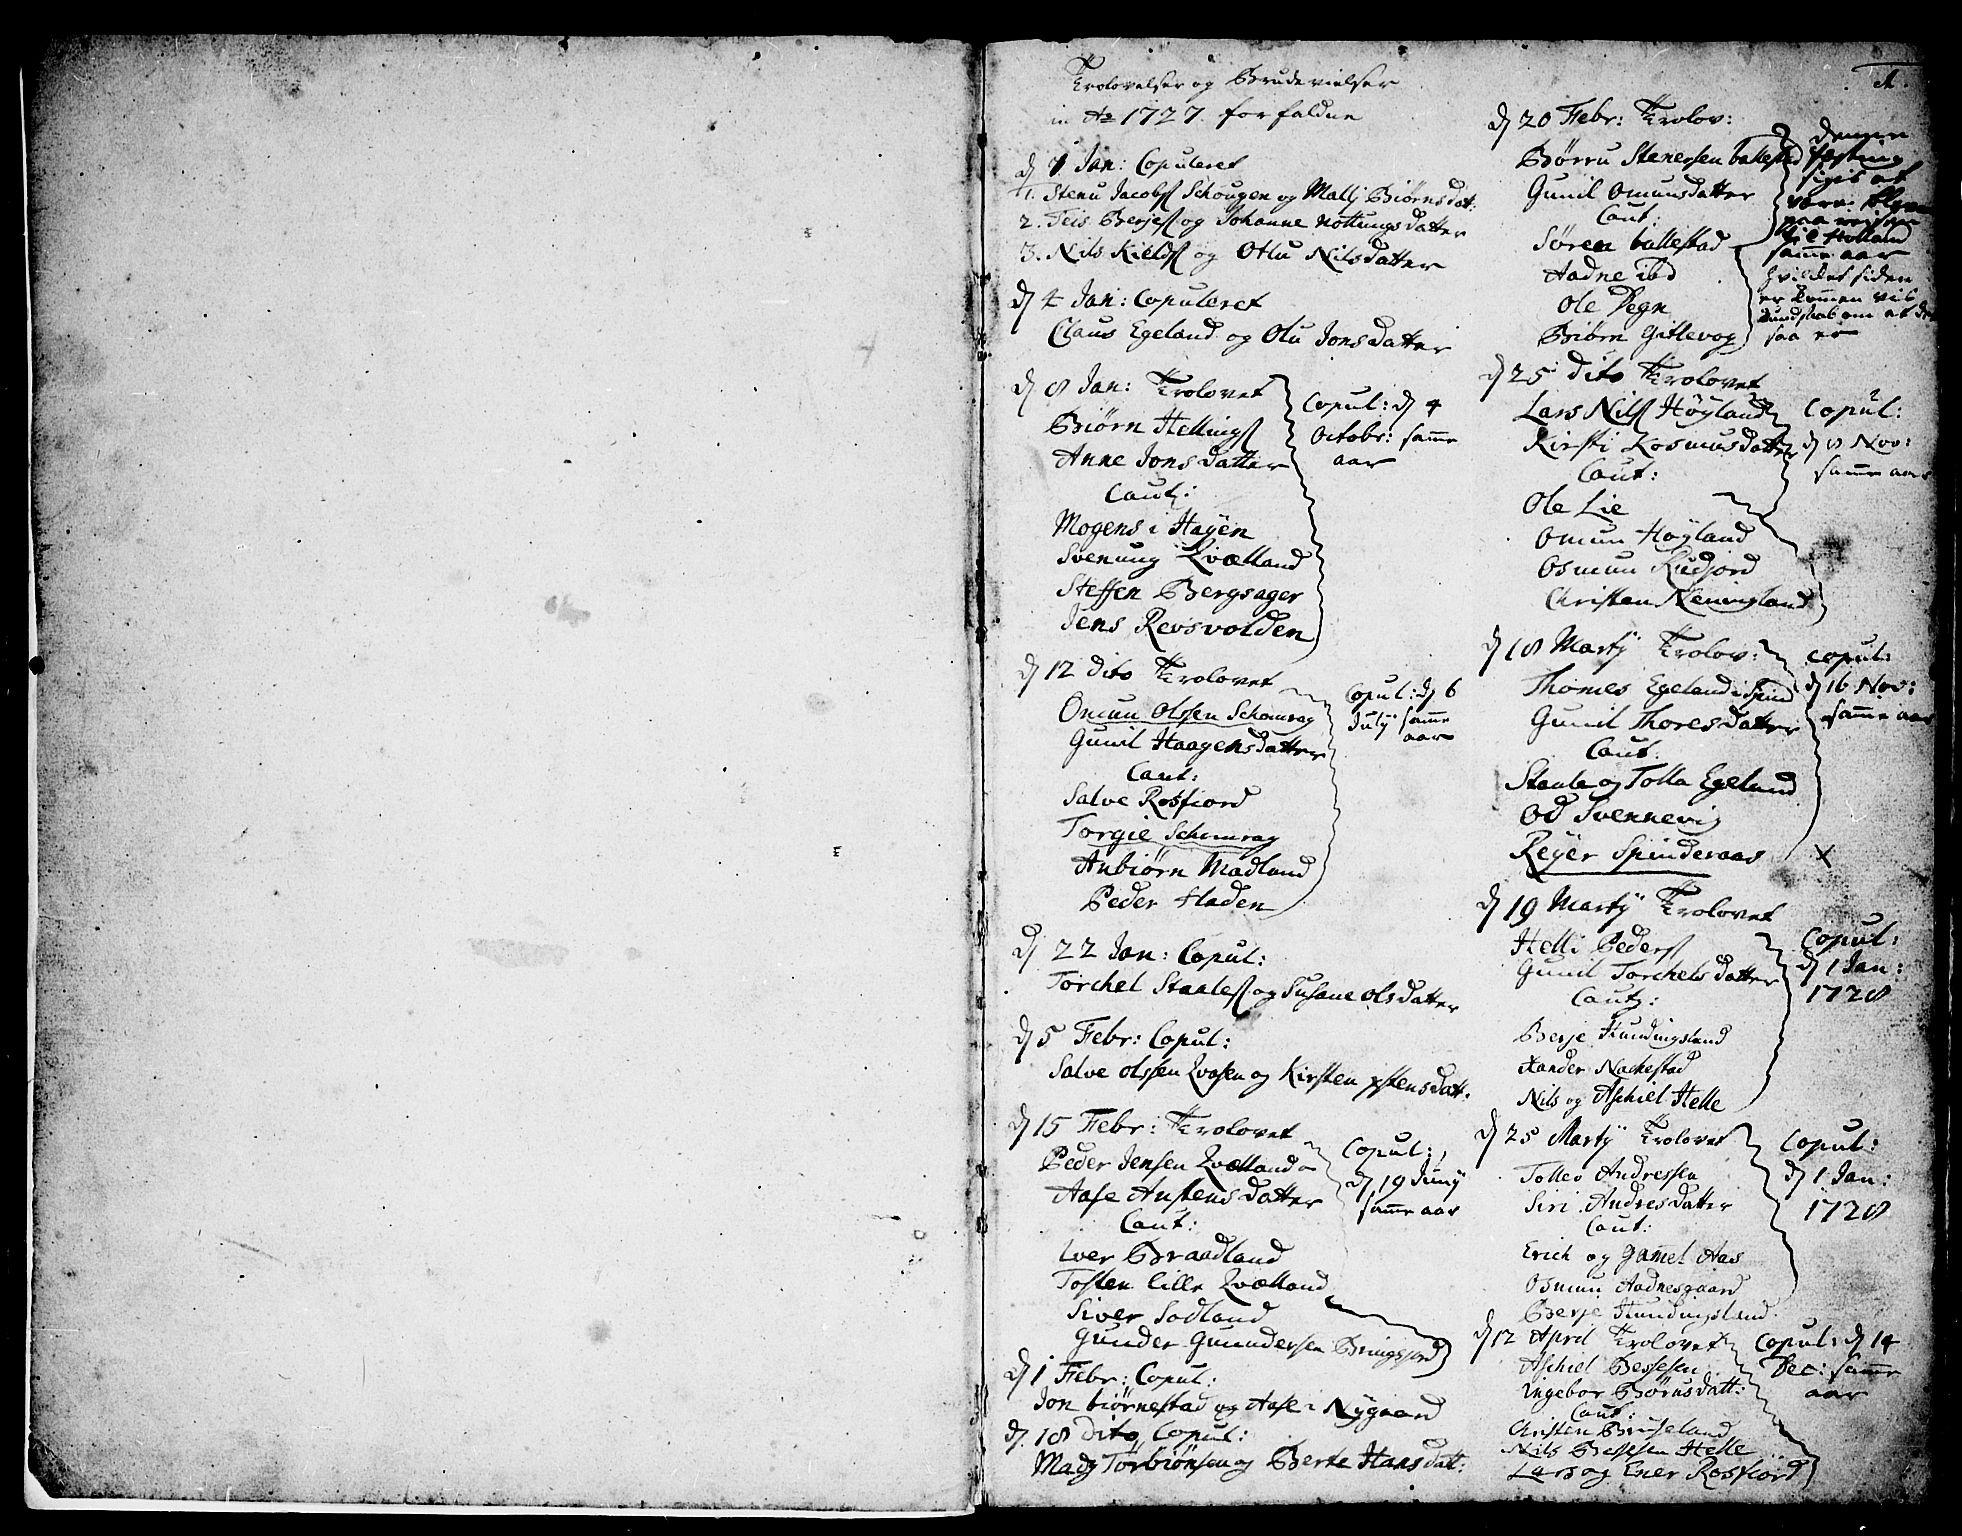 SAK, Lyngdal sokneprestkontor, F/Fa/Fac/L0002: Ministerialbok nr. A 2, 1727-1815, s. 0-1